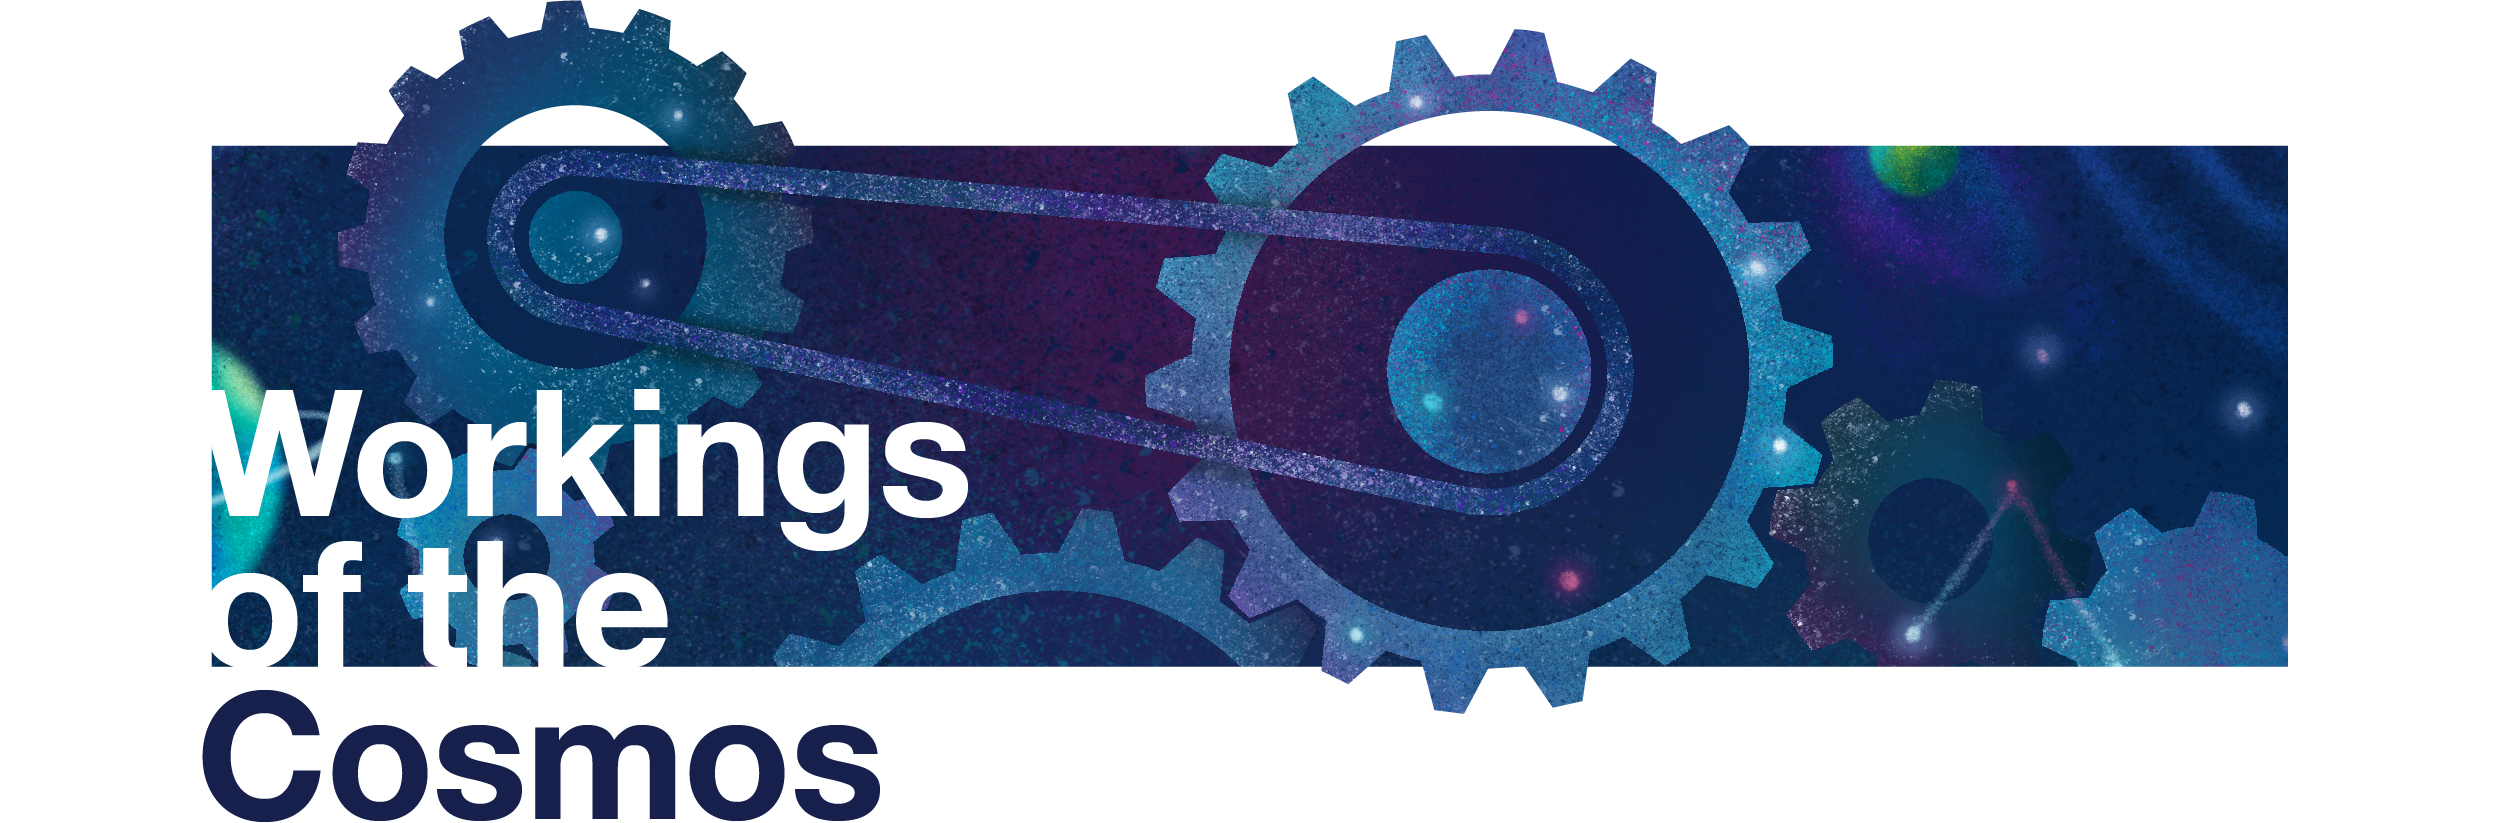 workings-of-the-cosmos-banner_2.jpg